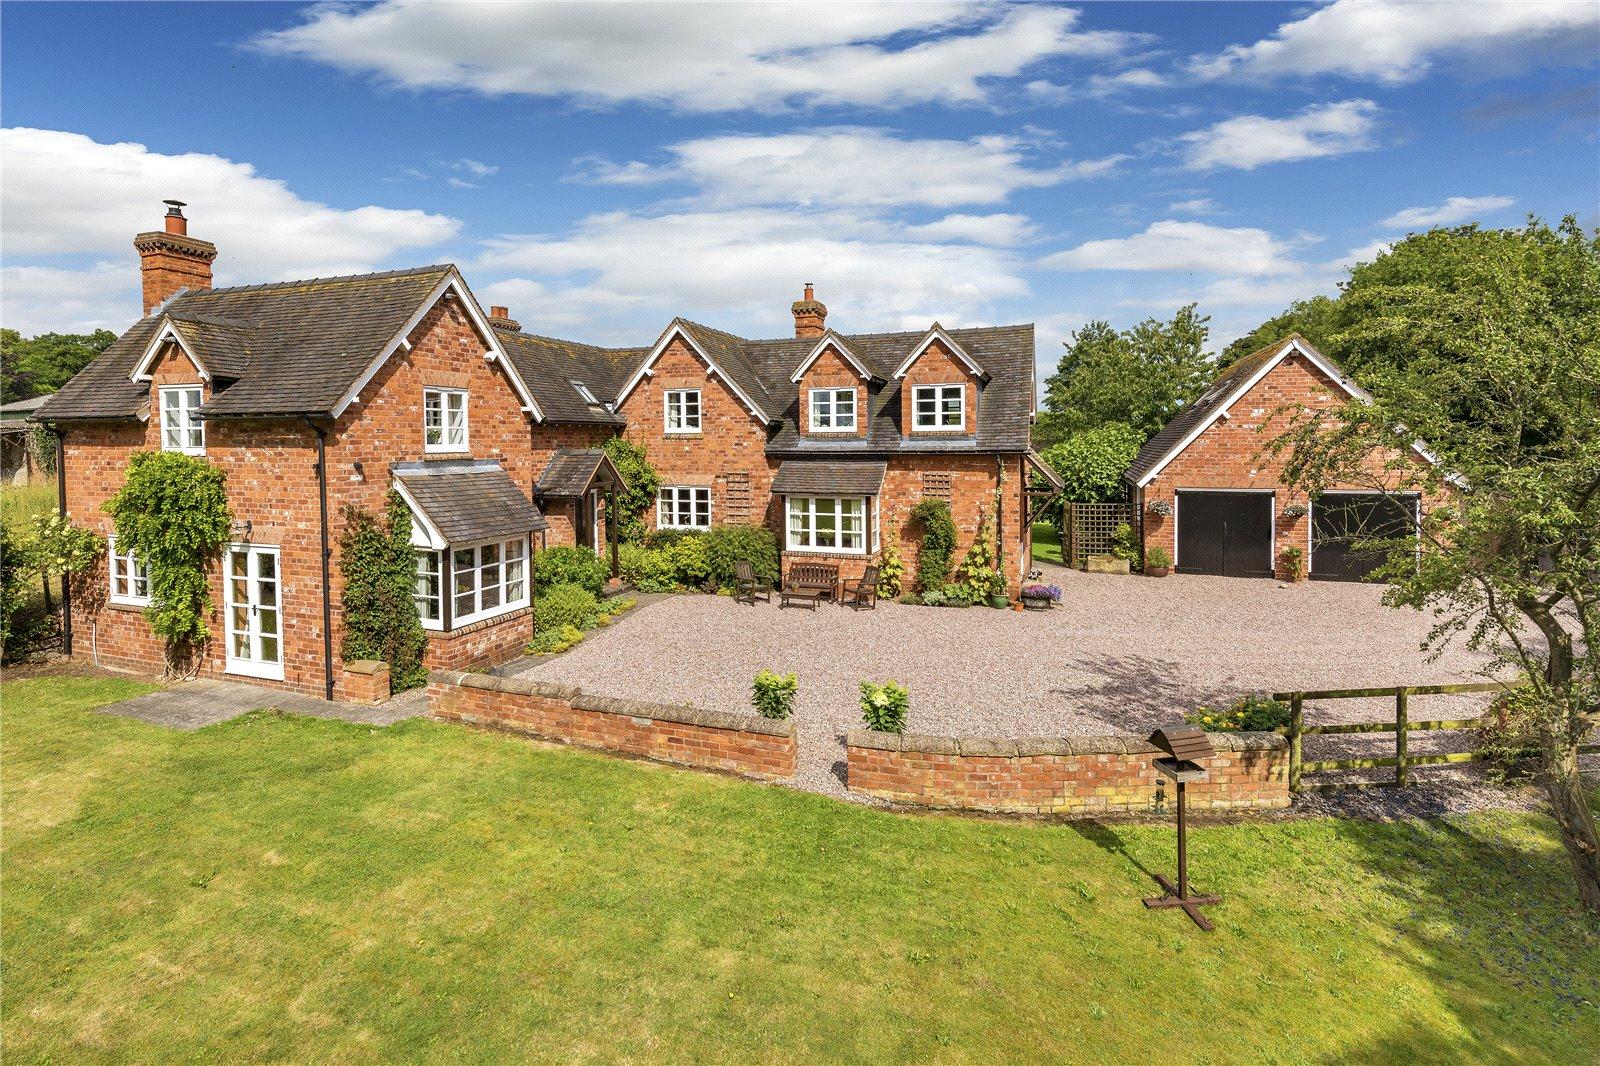 Shray Hill Cottage, Shray Hill, Telford, Shropshire, TF6